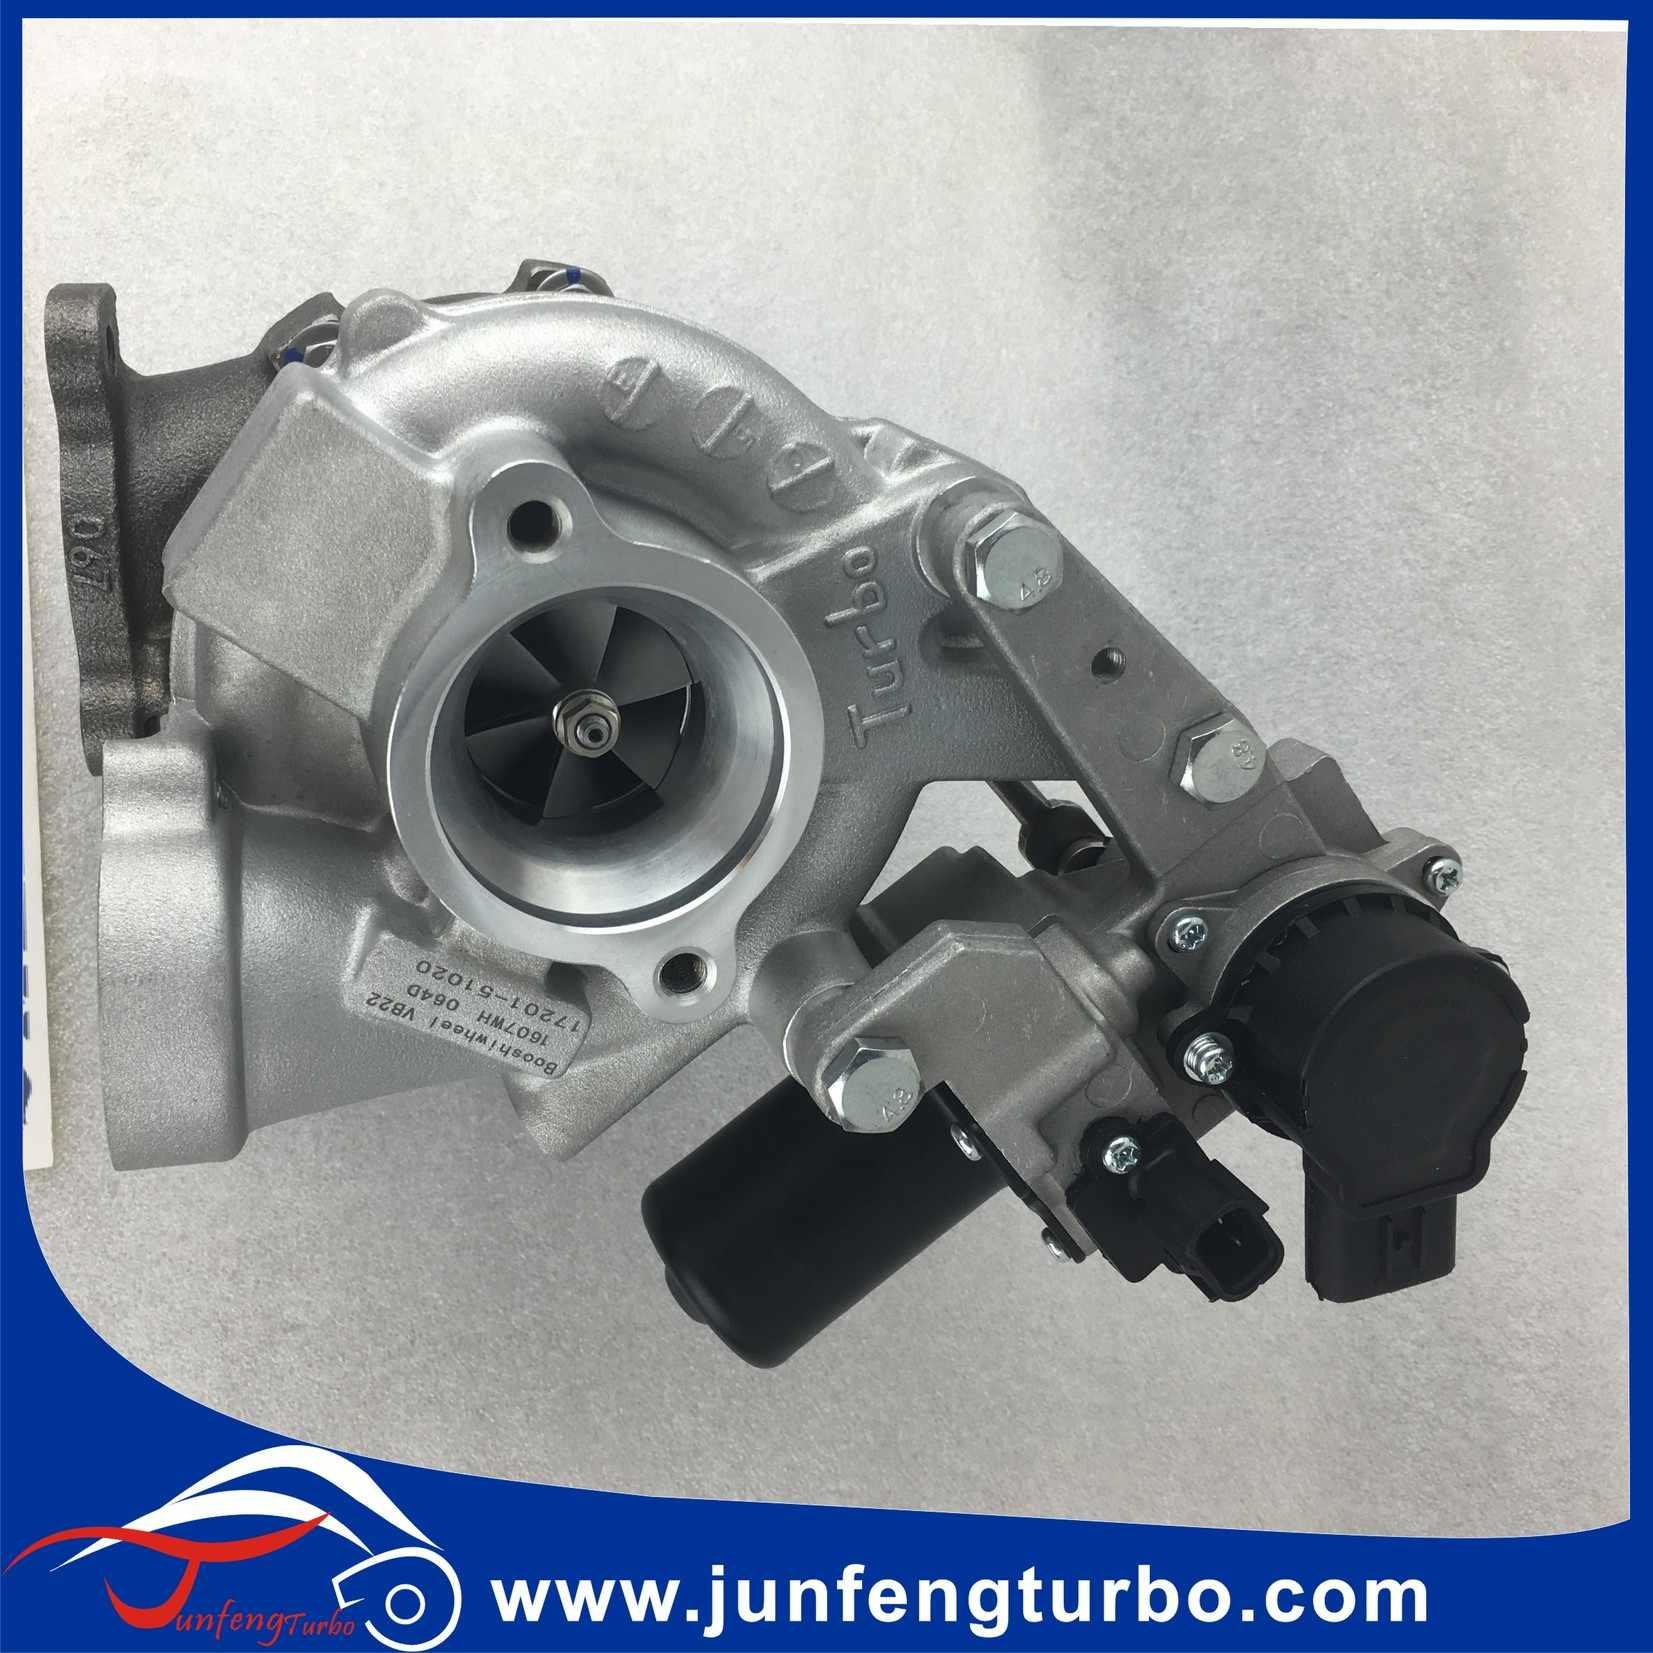 RHV4 Toyota Turbo 17201-51020 1720151020 VB22 engine 1VD-FTV